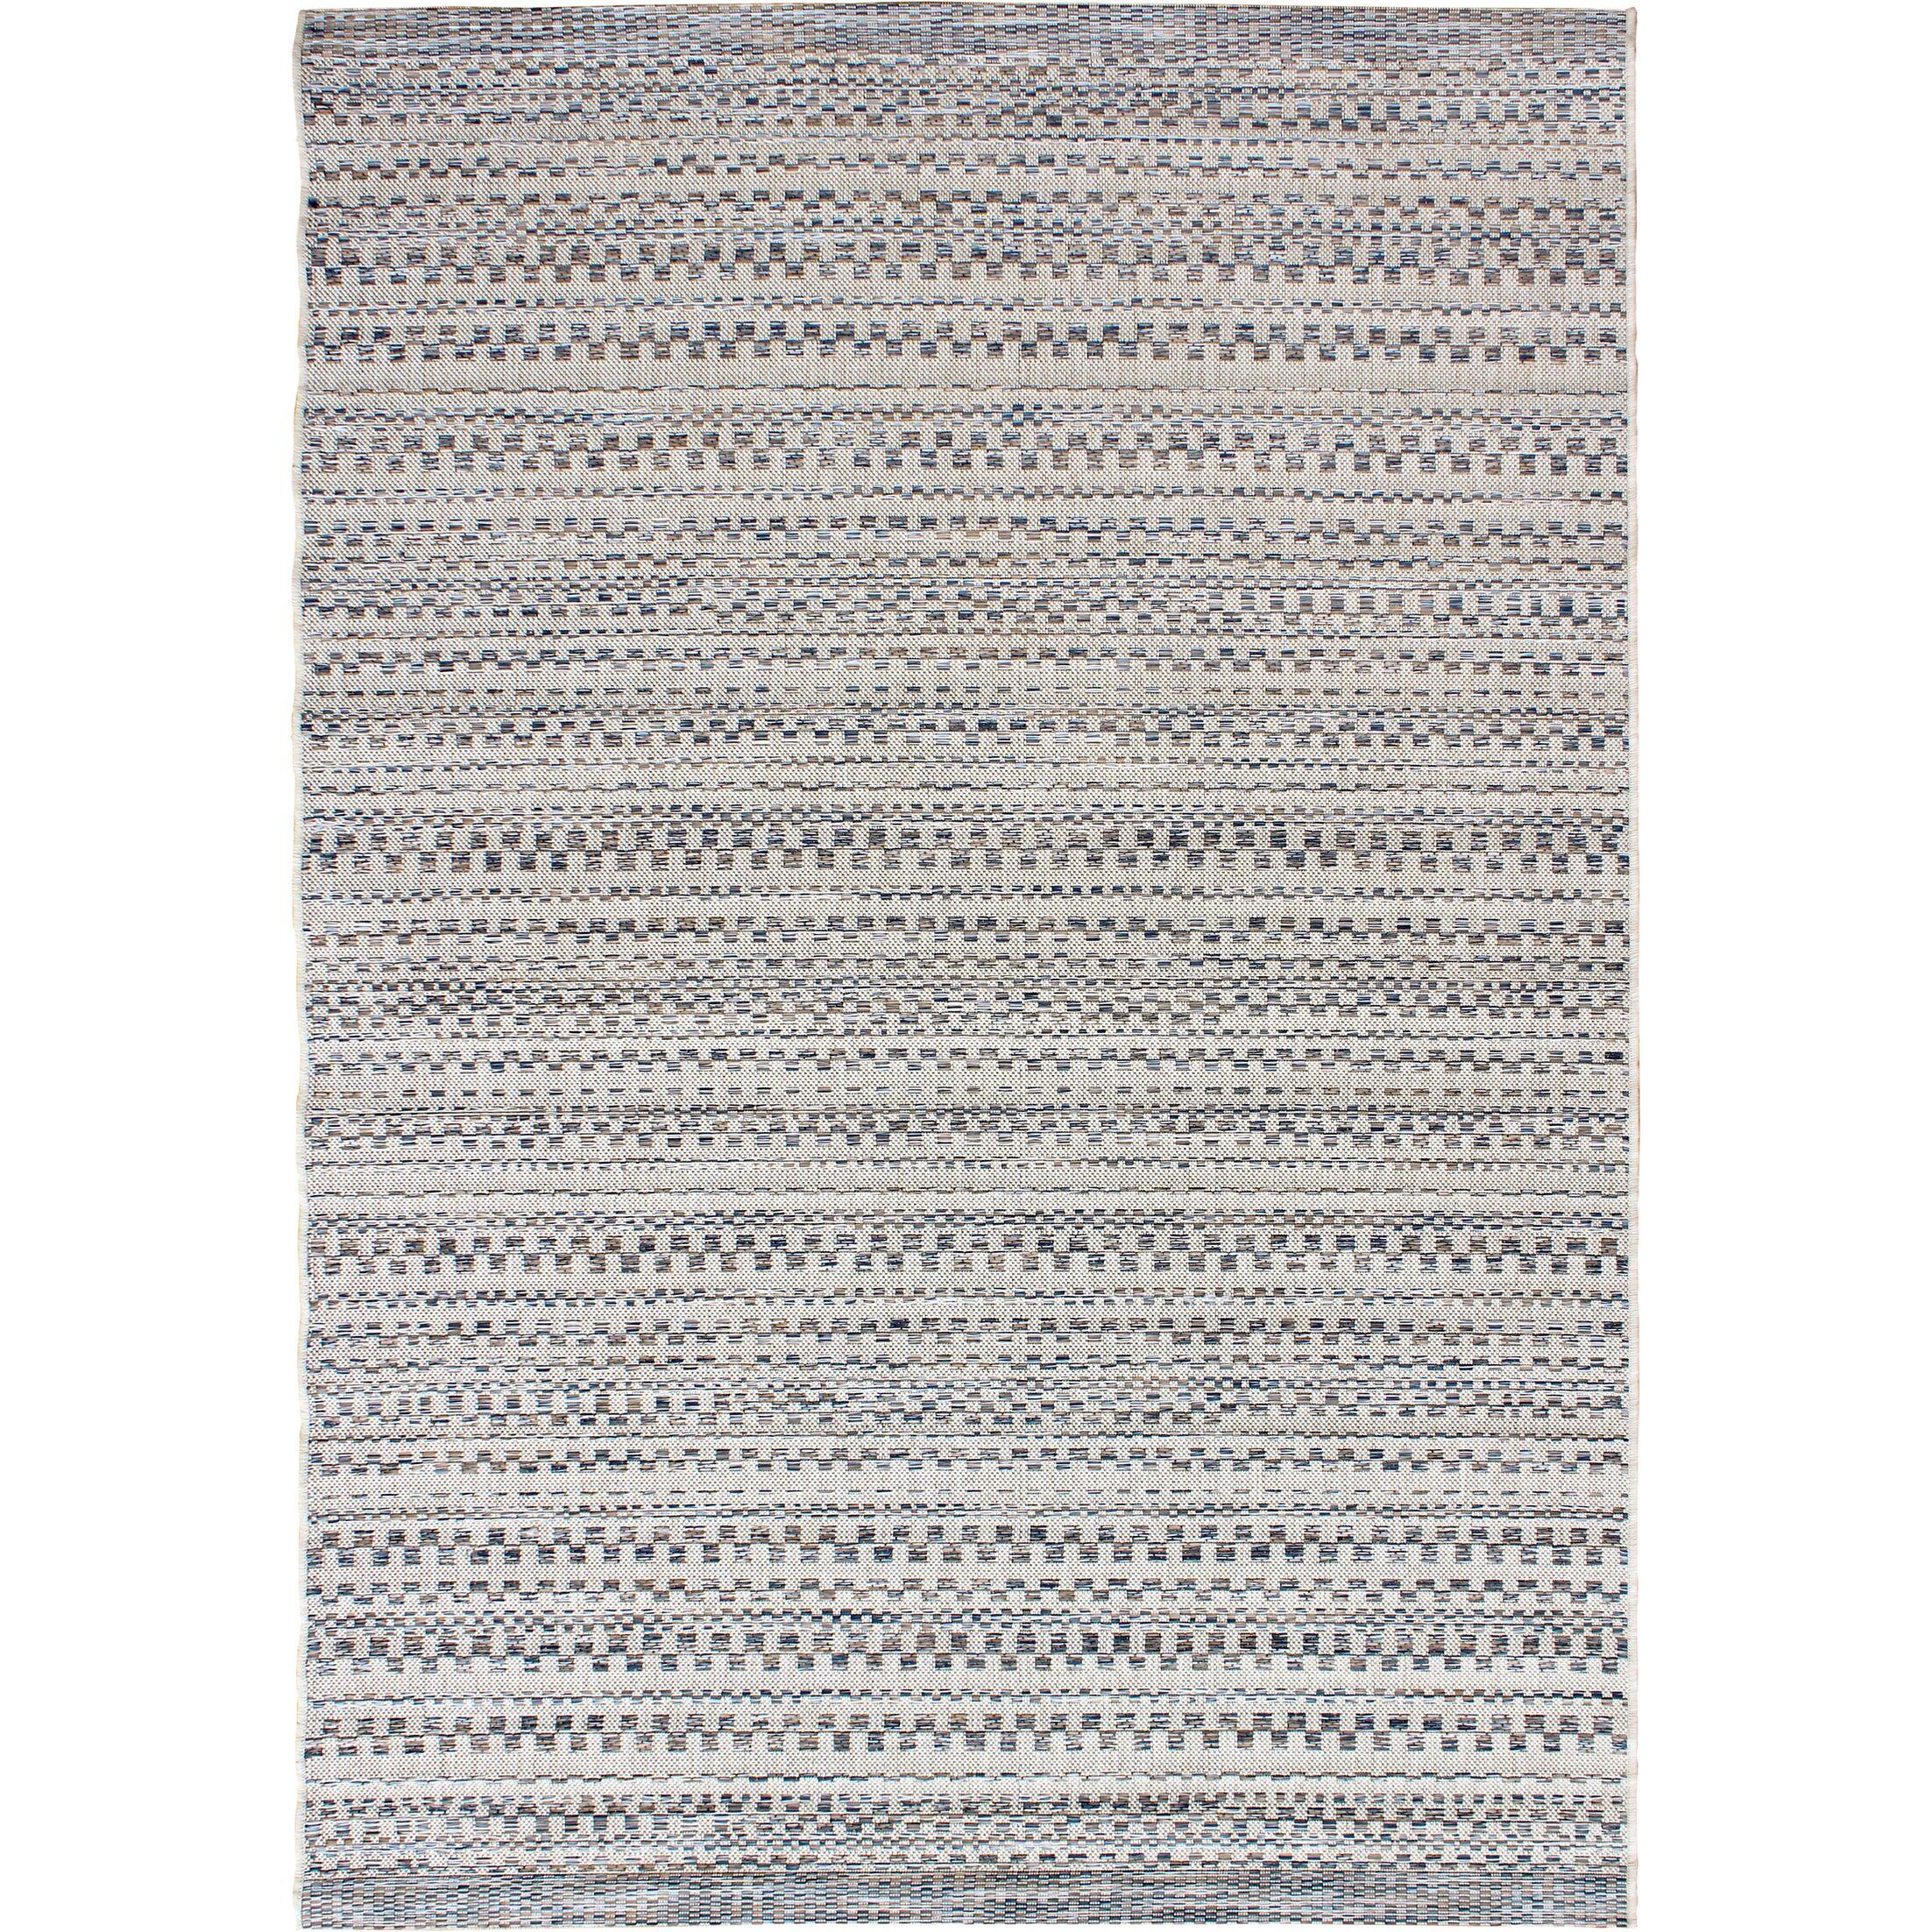 Papillion Dark Blue/Ivory Indoor/Outdoor Area Rug Rug Size: 5'1